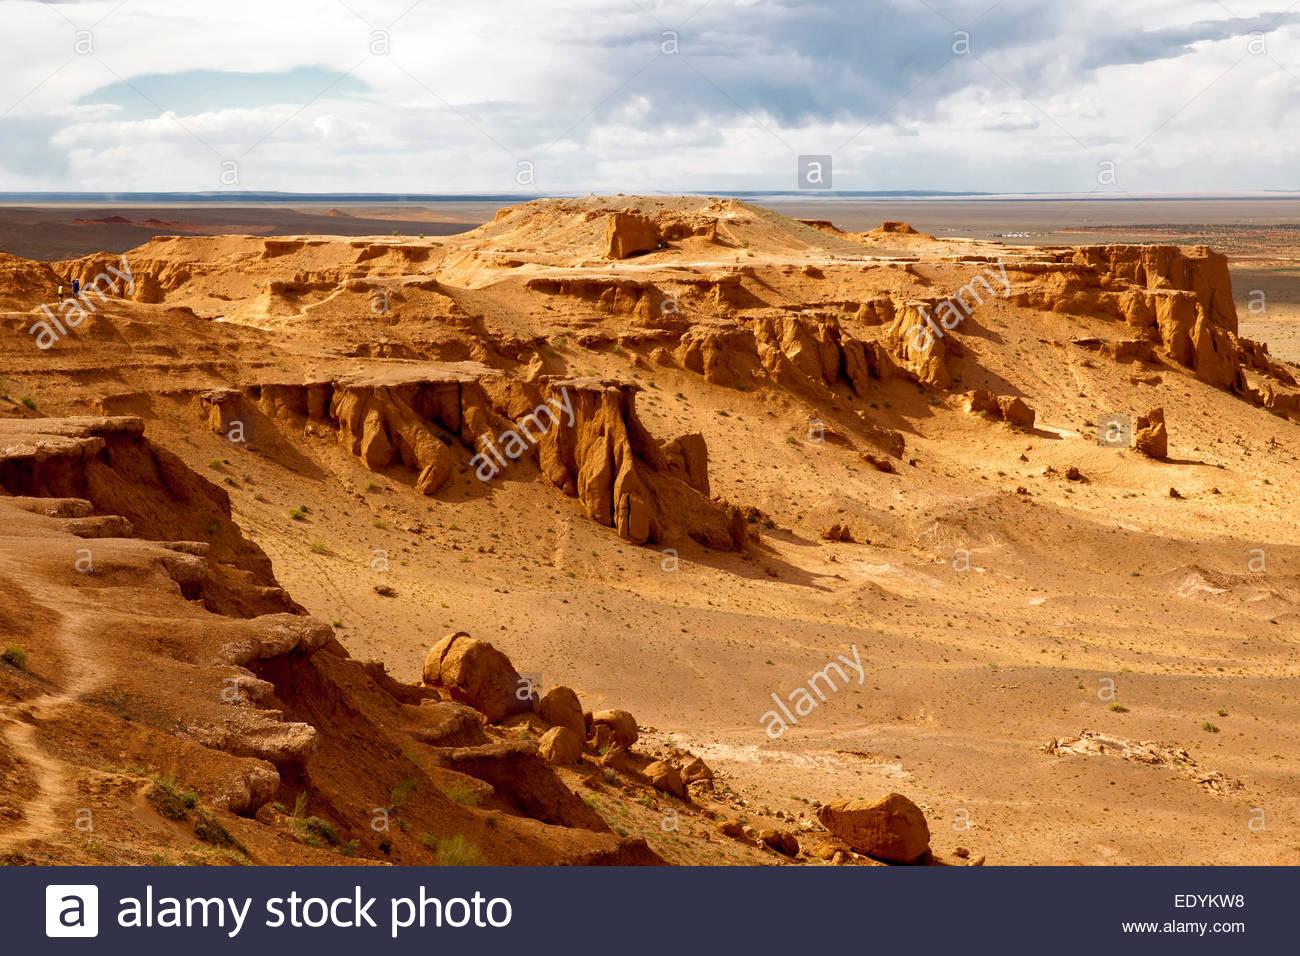 Bayanzag, also Flaming Cliffs, Gobi Desert, Ömnögovi Province, Mongolia - Stock Image